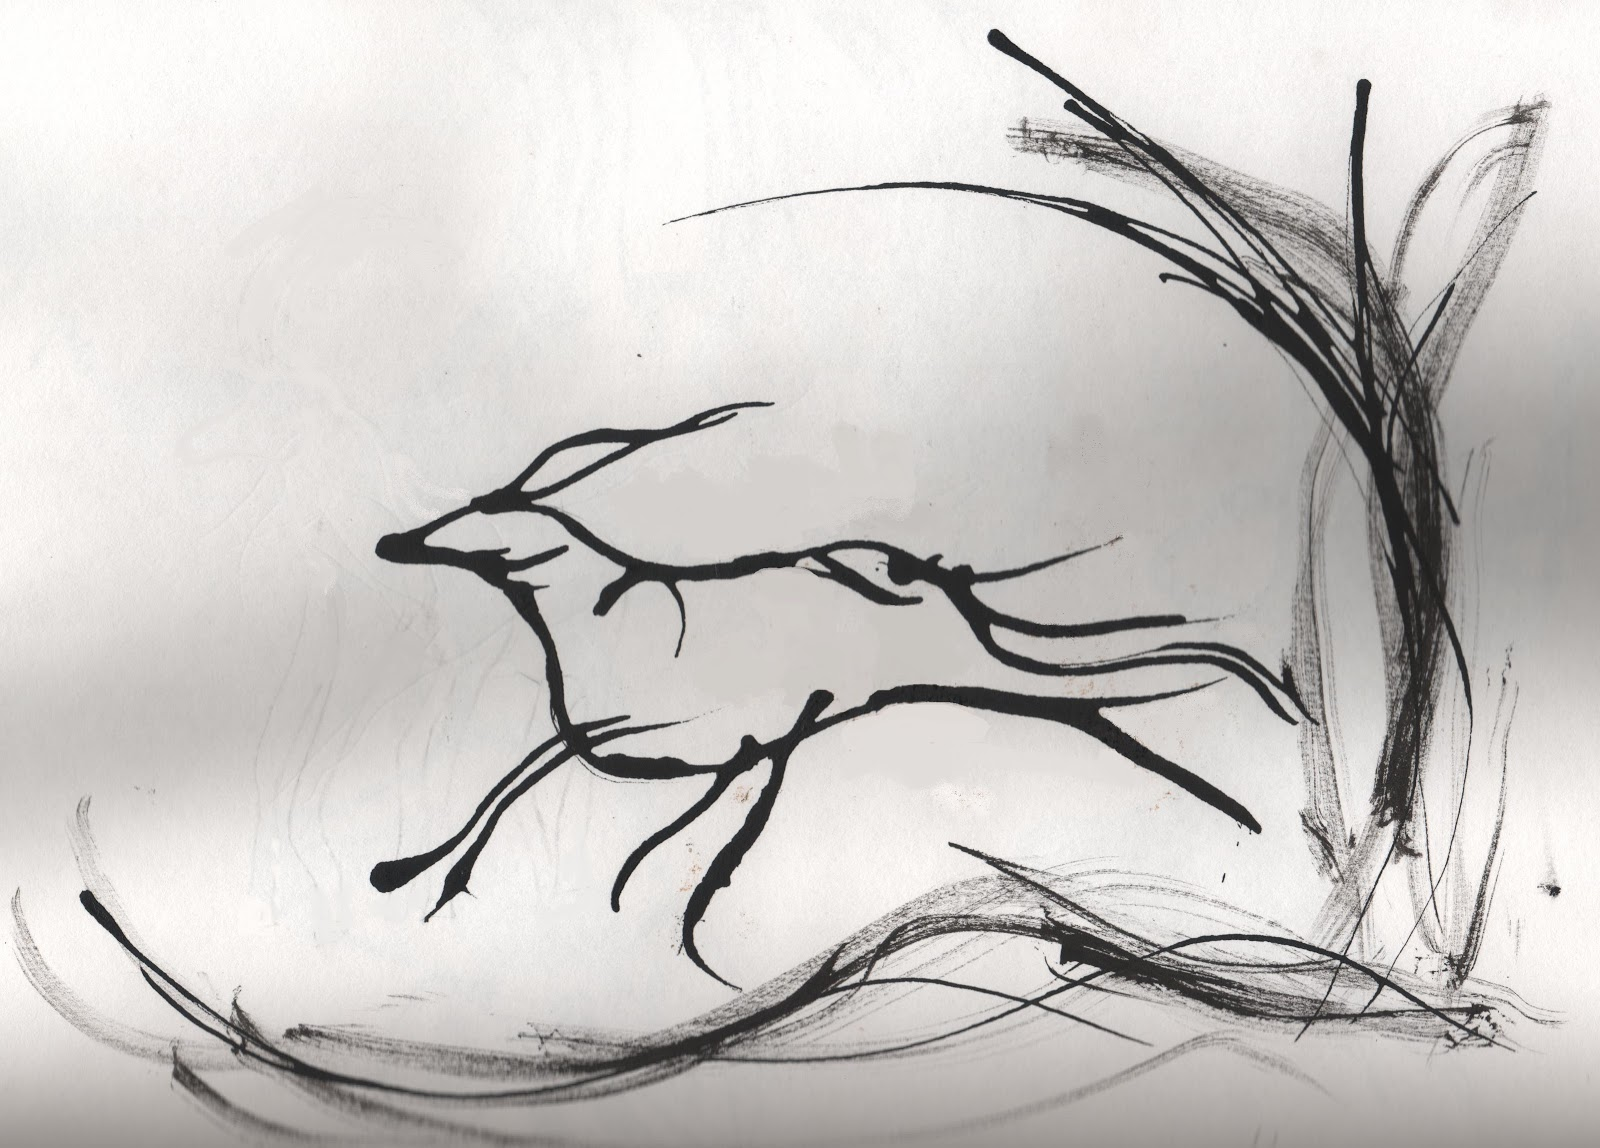 Line Drawing Deer : Dragon deer by gryphowizardgirl on deviantart